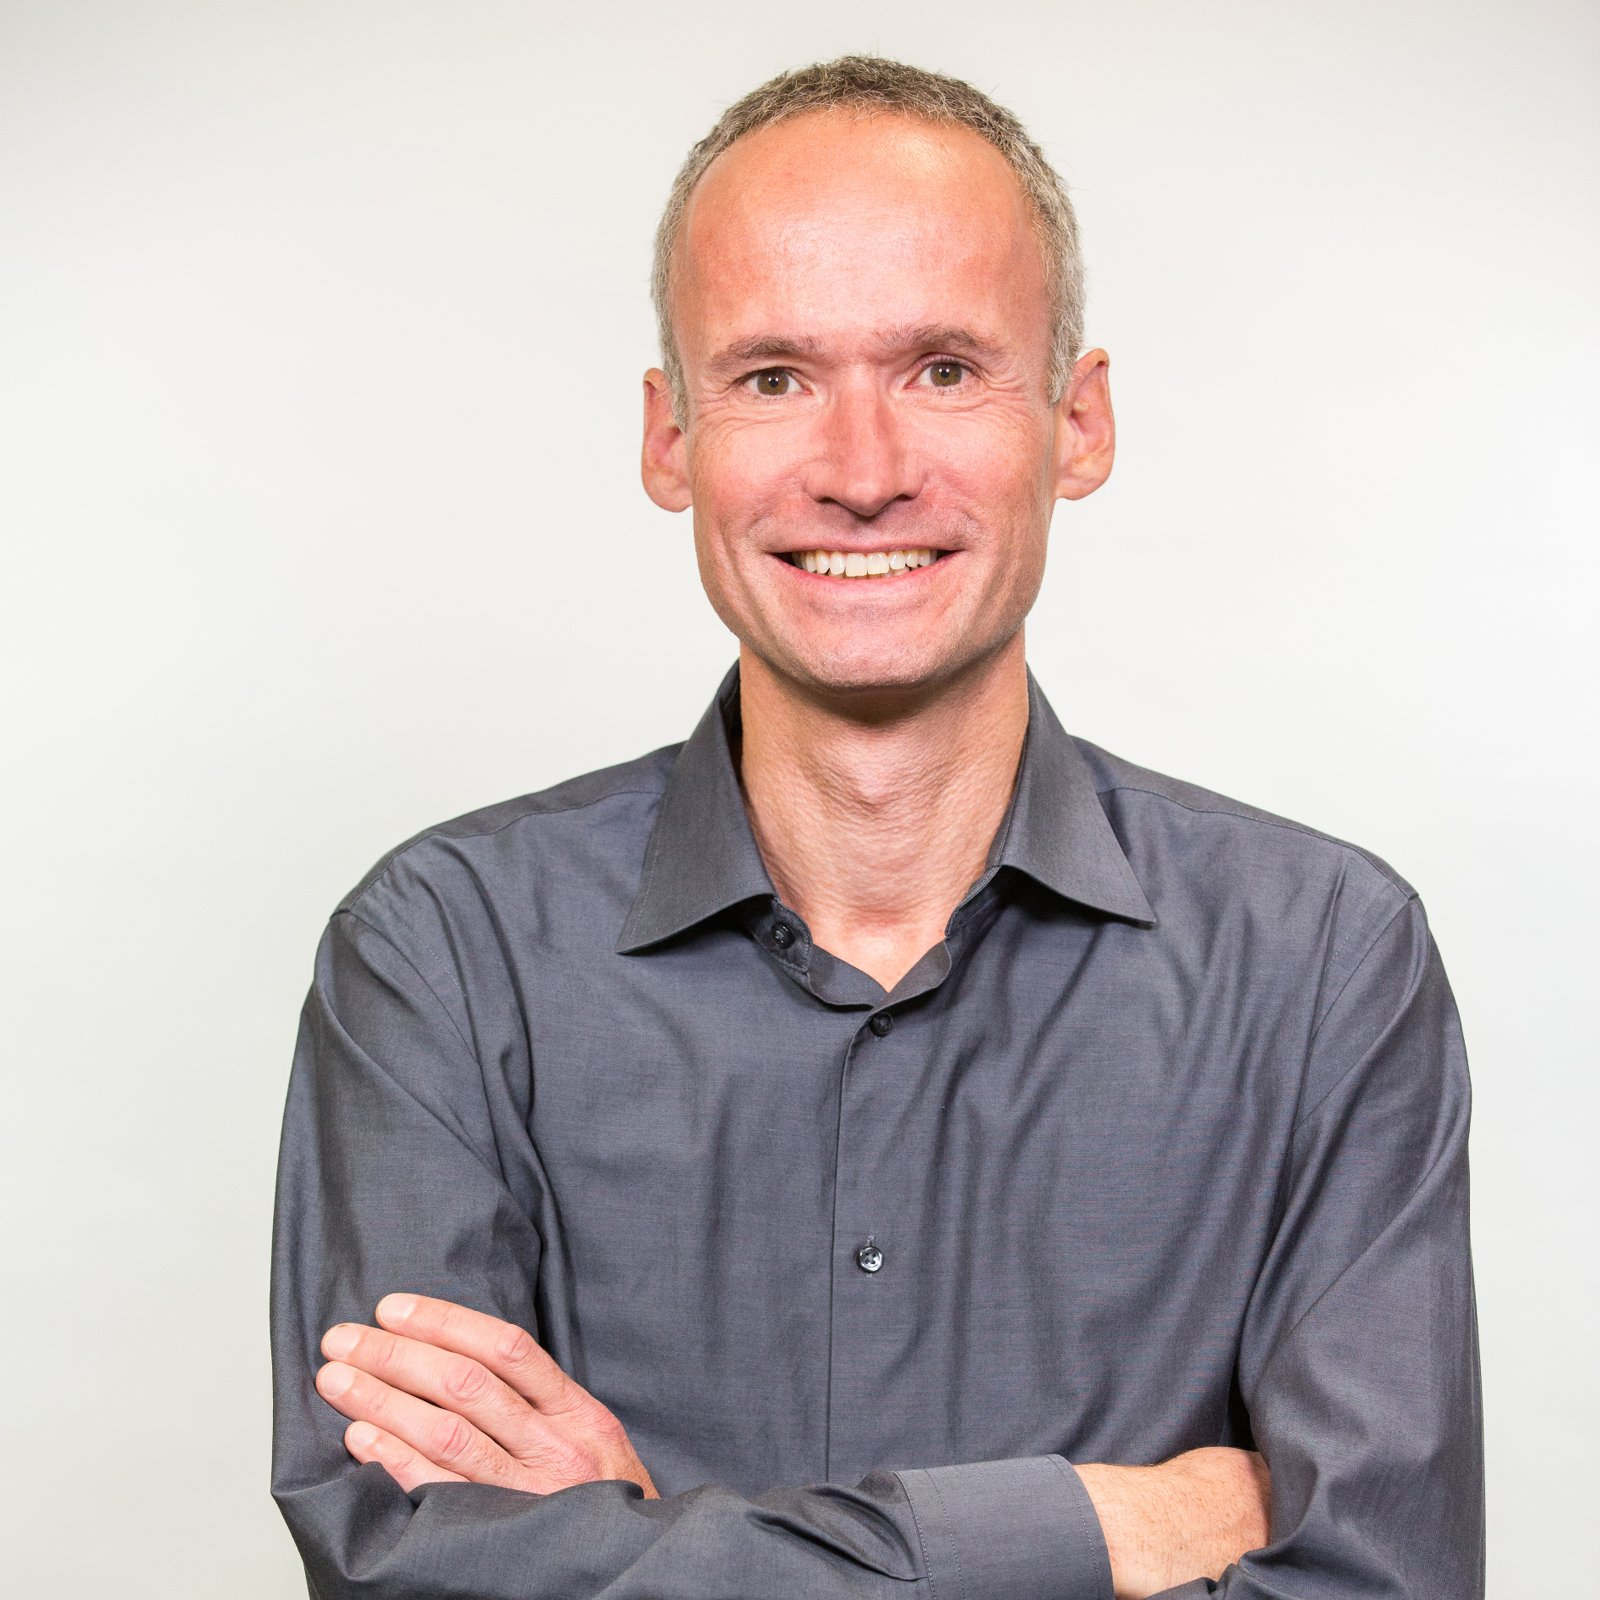 Dr. Boris Mannhardt